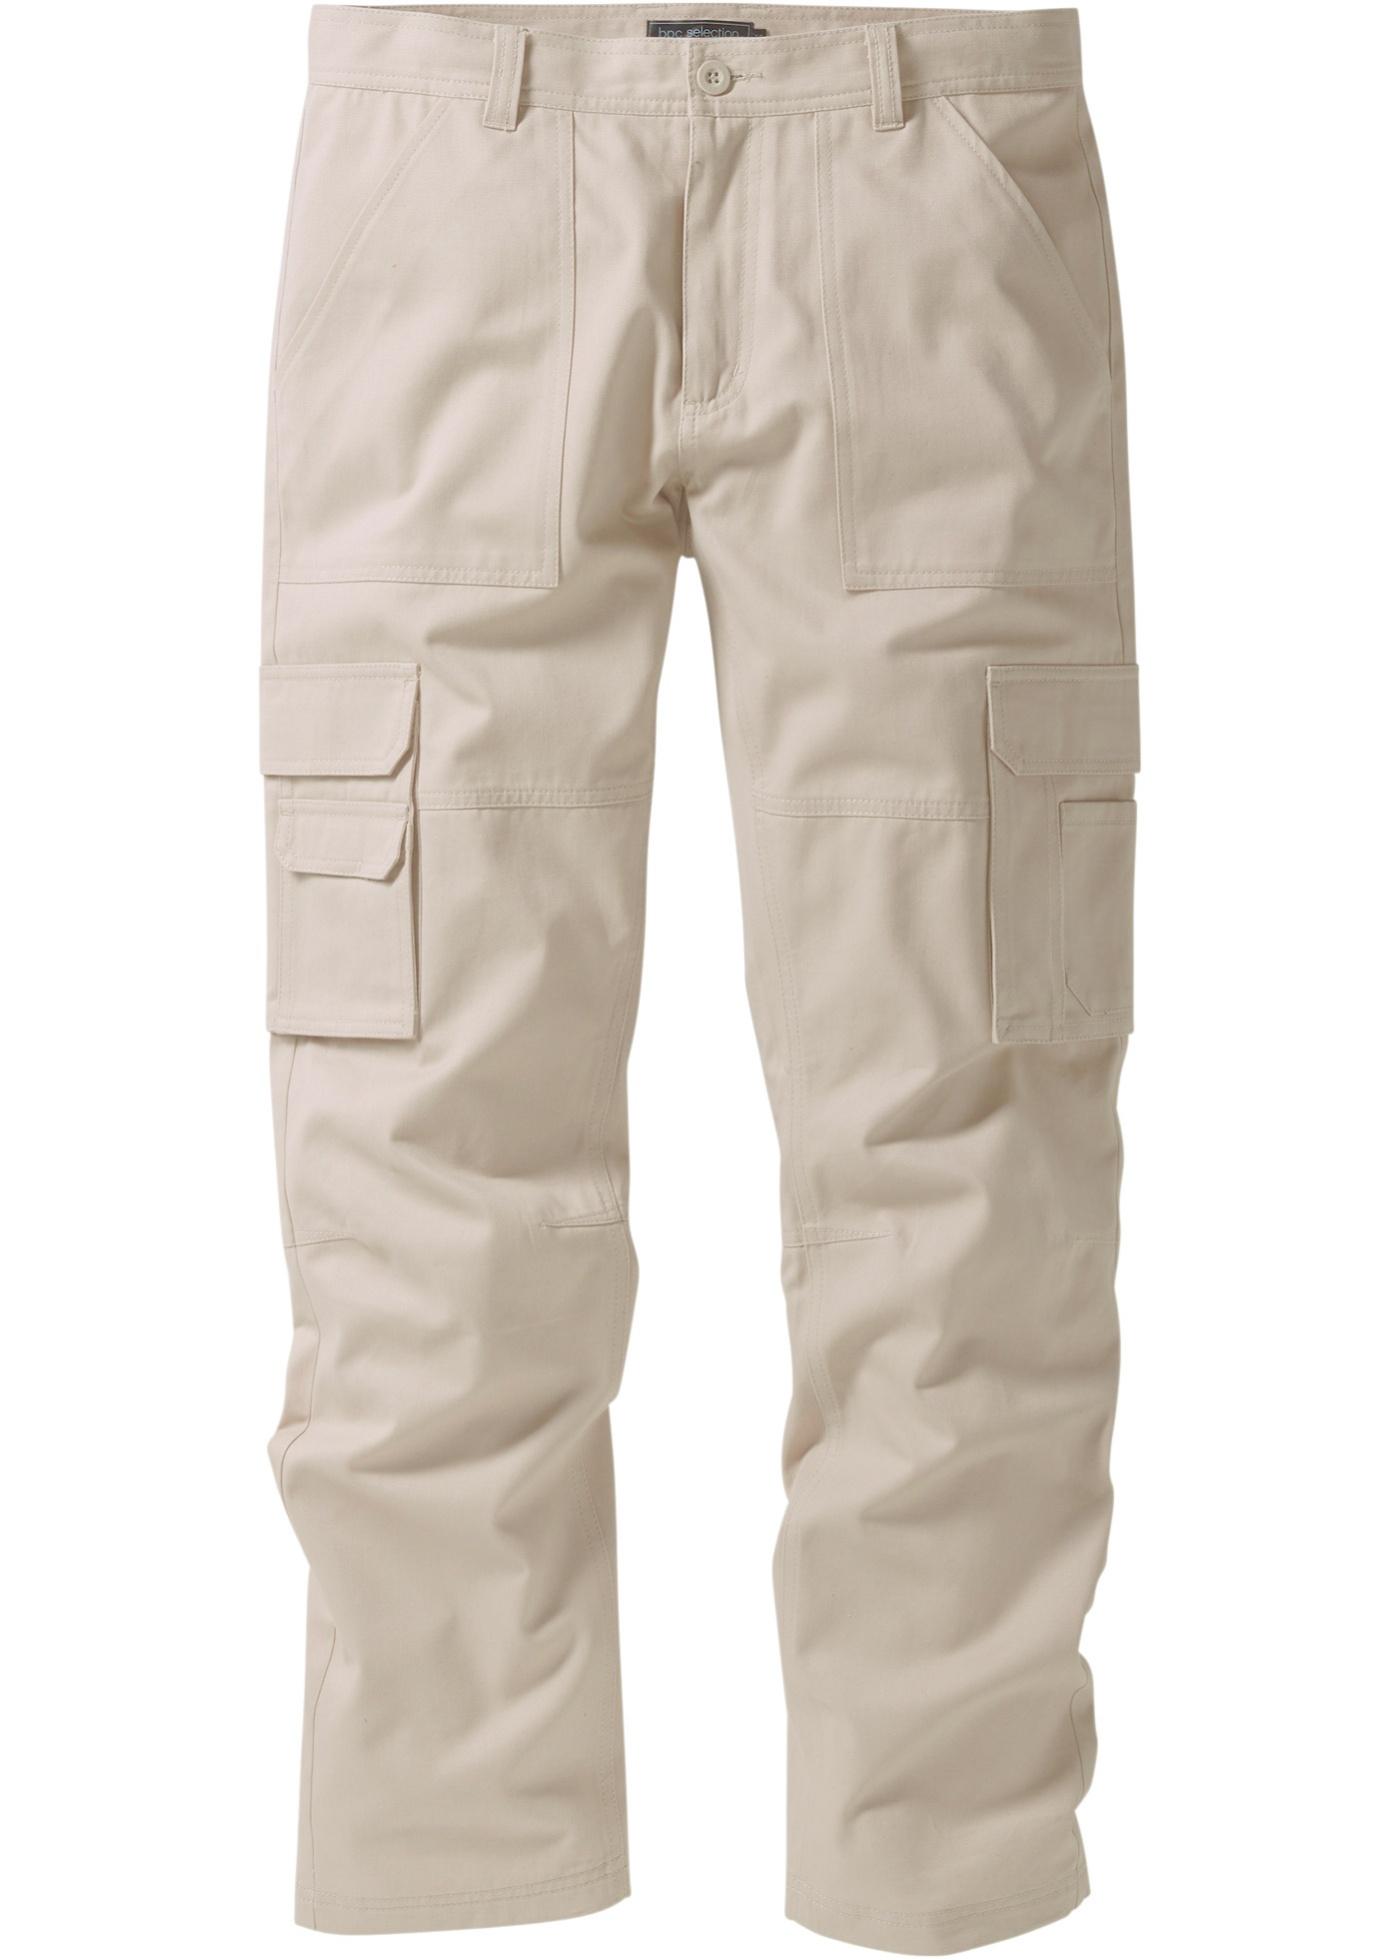 Kargo kalhoty Regular Fit Straight - Béžová